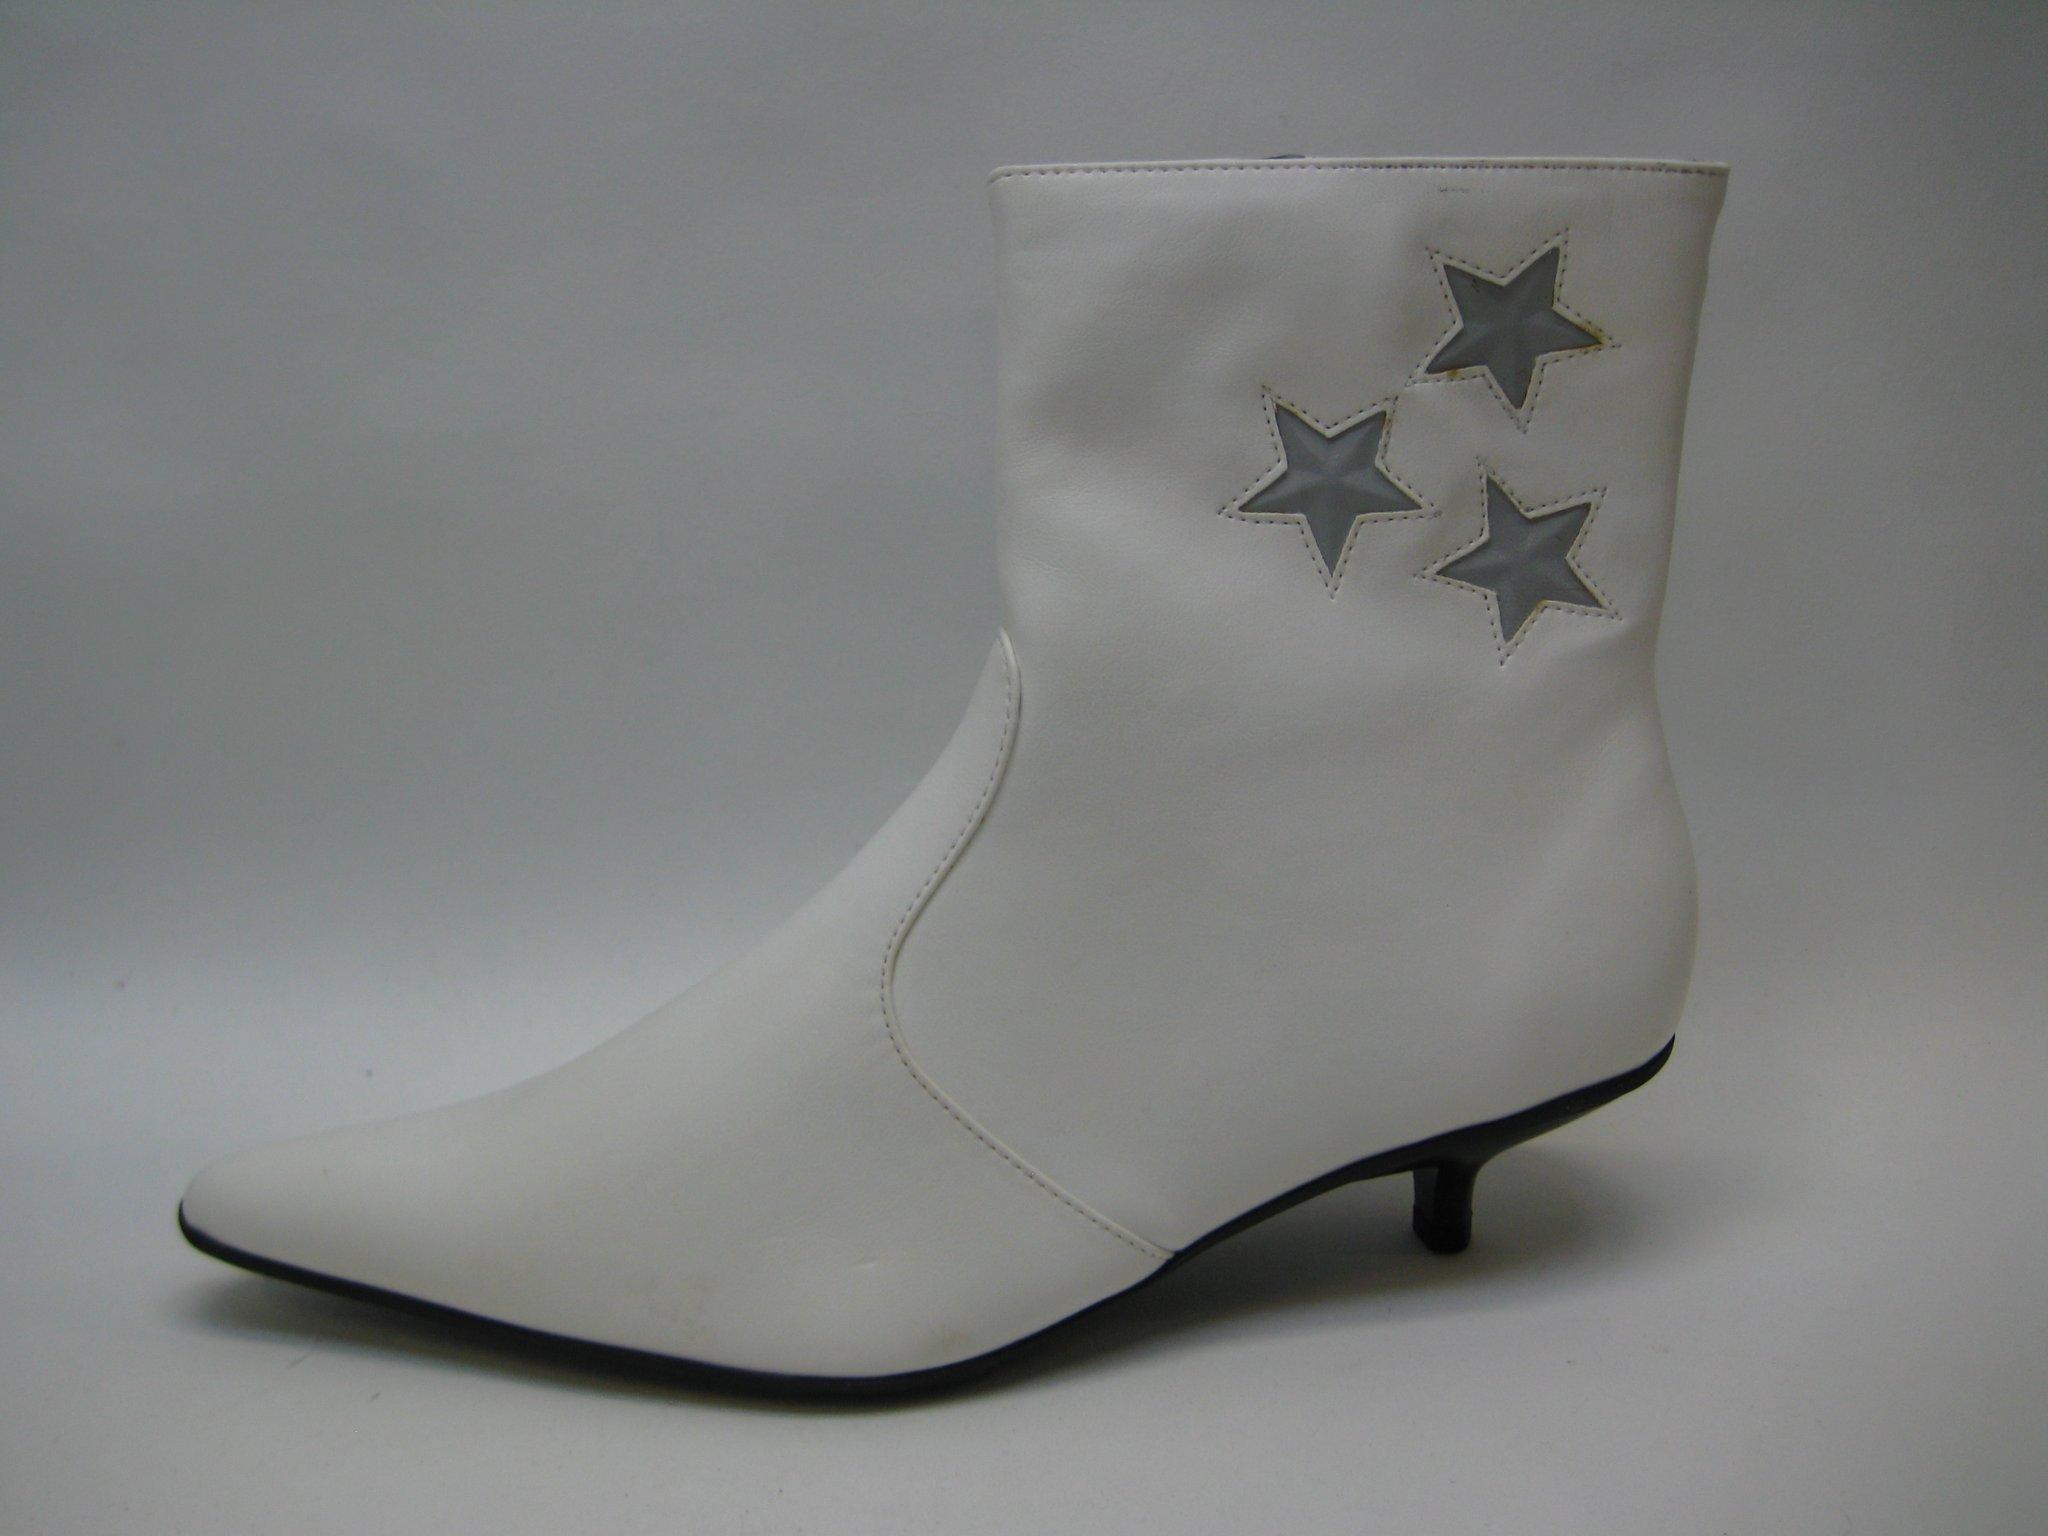 Boots (Retro) stövel vintage OBS! Rea (394564346) ᐈ